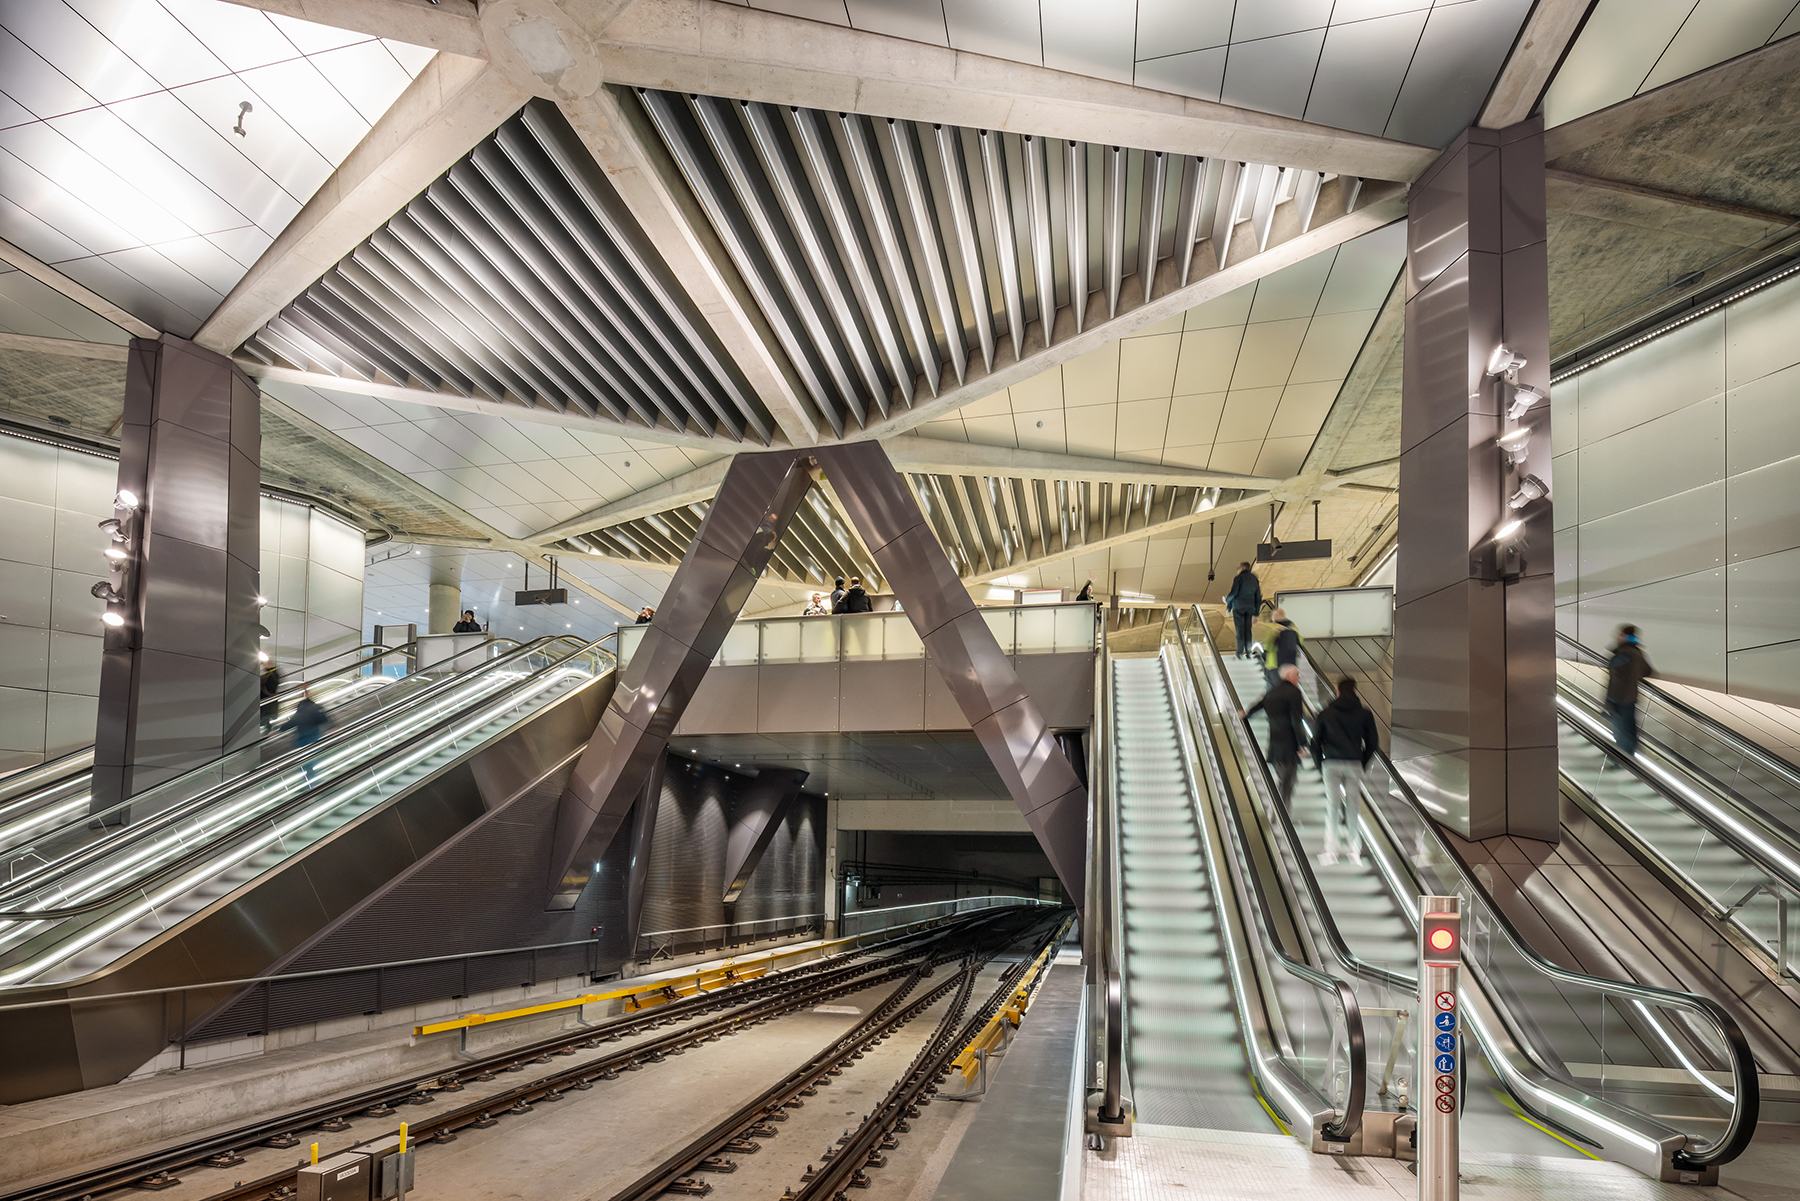 1-noord-zuidlijn-amsterdam-cs-verdeelhal-benthem-crouwel-architects-gemeente-amsterdam-metro-tram-jannes-linders1